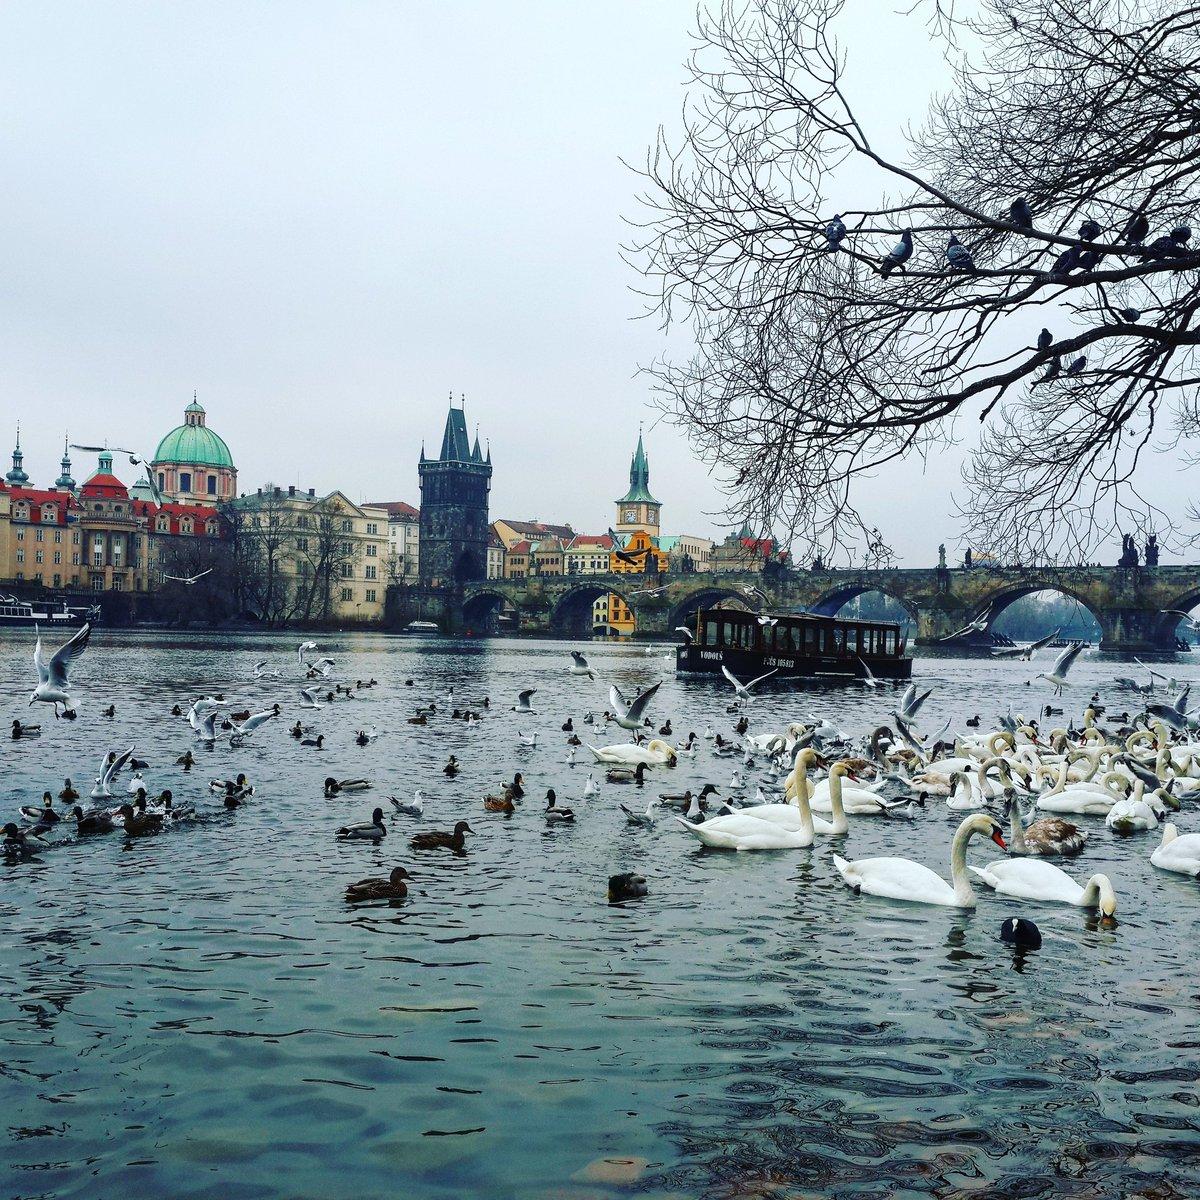 Amazing panorama of the Charles Bridge in #Prague / #travel #travelblog #travelblogger #traveling #exploring #visitCZ RT<br>http://pic.twitter.com/Ca6xb3jKjZ